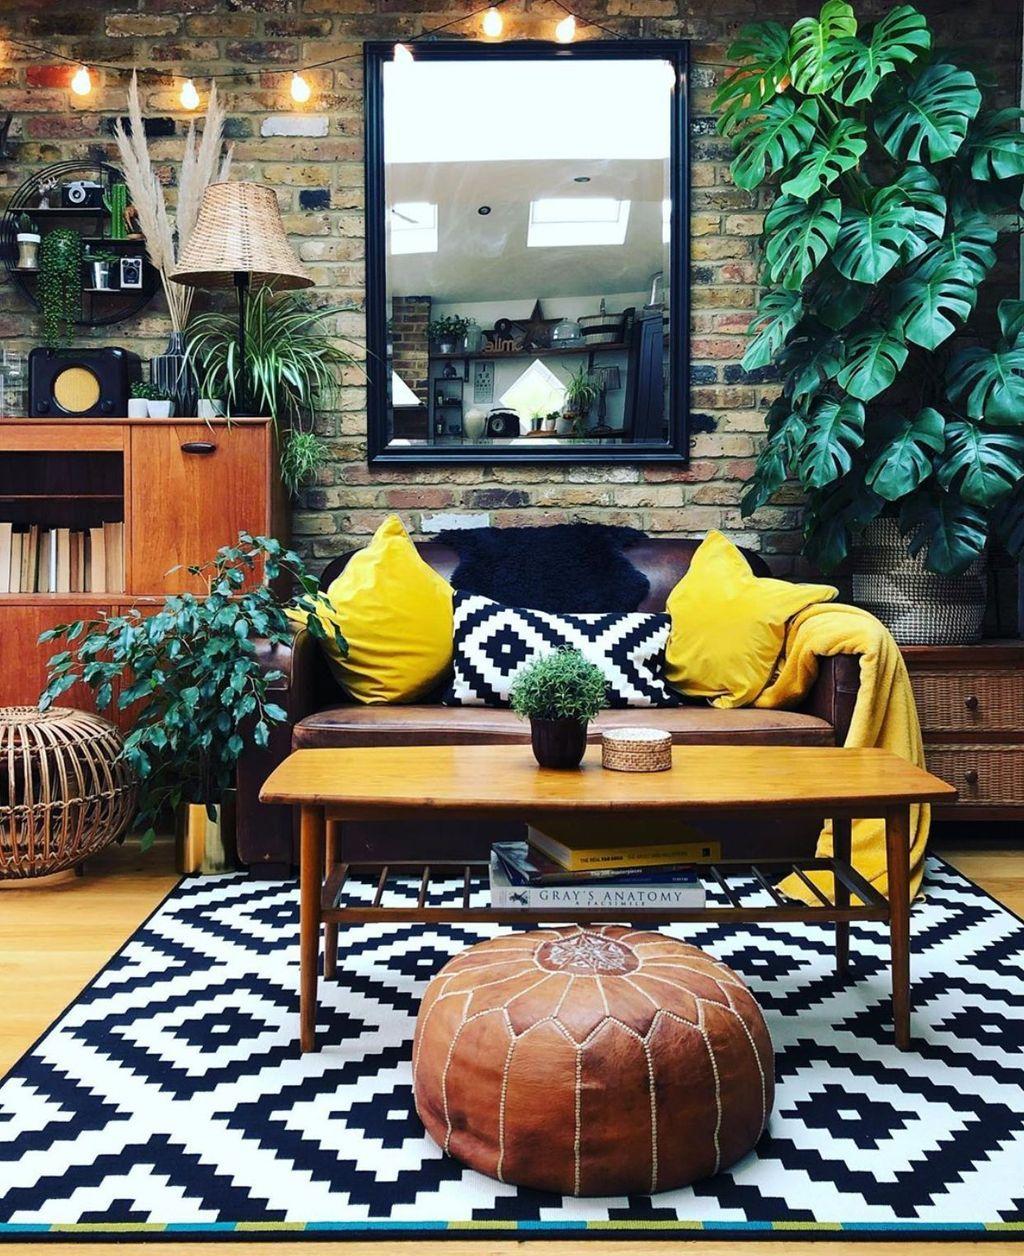 35 Charming Yellow Interior Design Ideas Best For Summer Sweetyhomee Home Interior Design Interior Design Home Decor